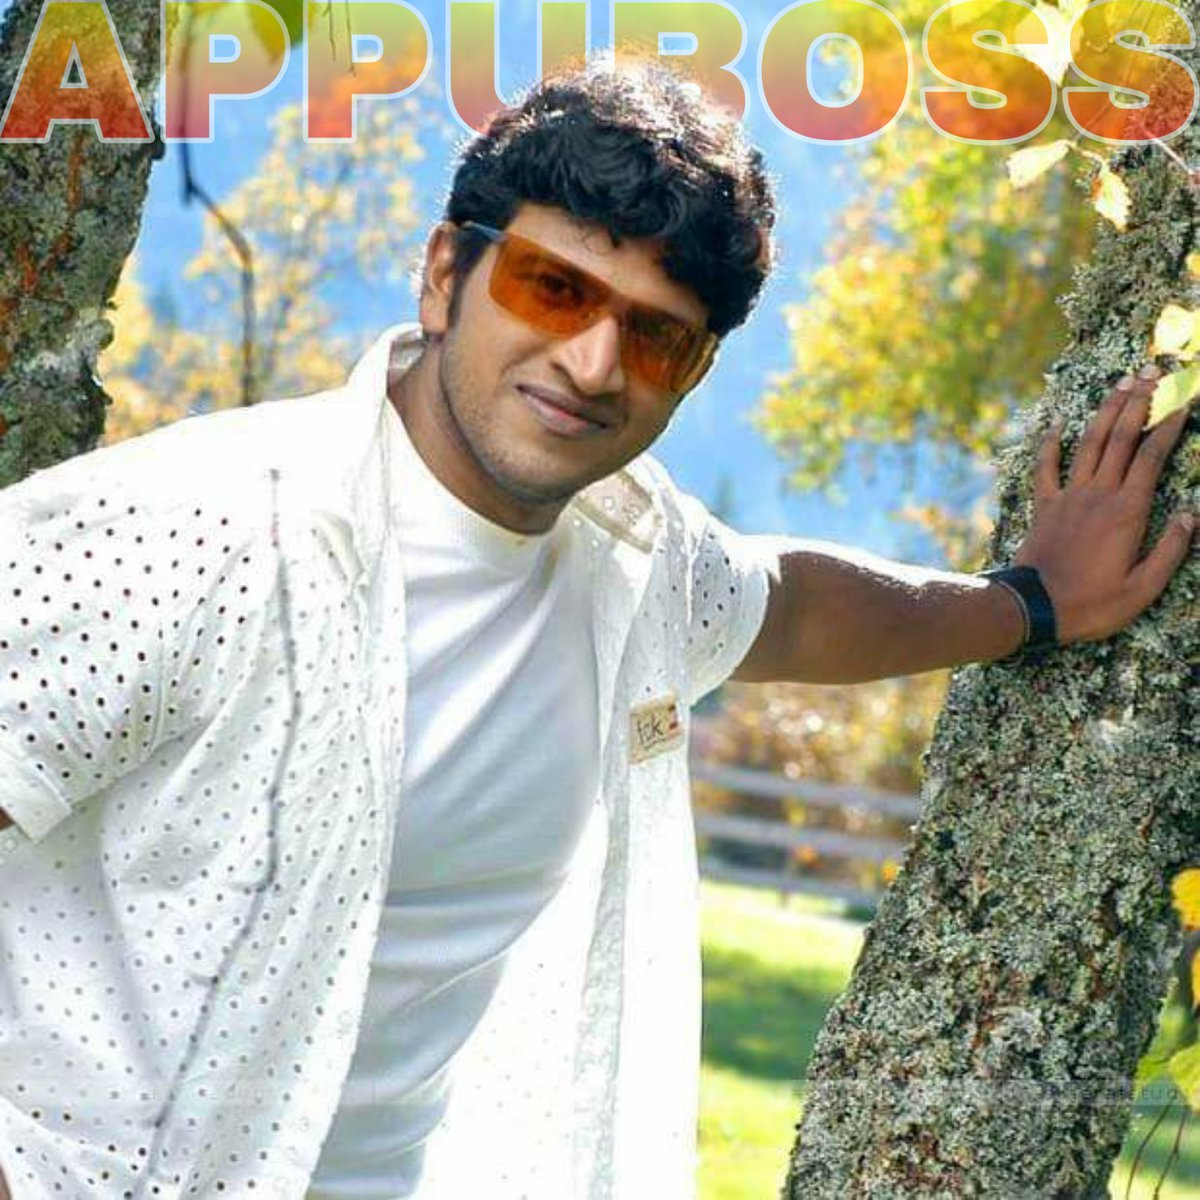 Appu Boss comment The Movie Name  #DrRajkumar #Rajkumar #Annavaru #Appu #AppuBoss #PRK #PuneethRajkumar  #BossOfSandalwoodShivaRajkumar   #ShivaRajkumar #Shivanna   #RaghavendraRajkumar #YuvaRajkumar #VinayRajkumar  #yuvarathnaa